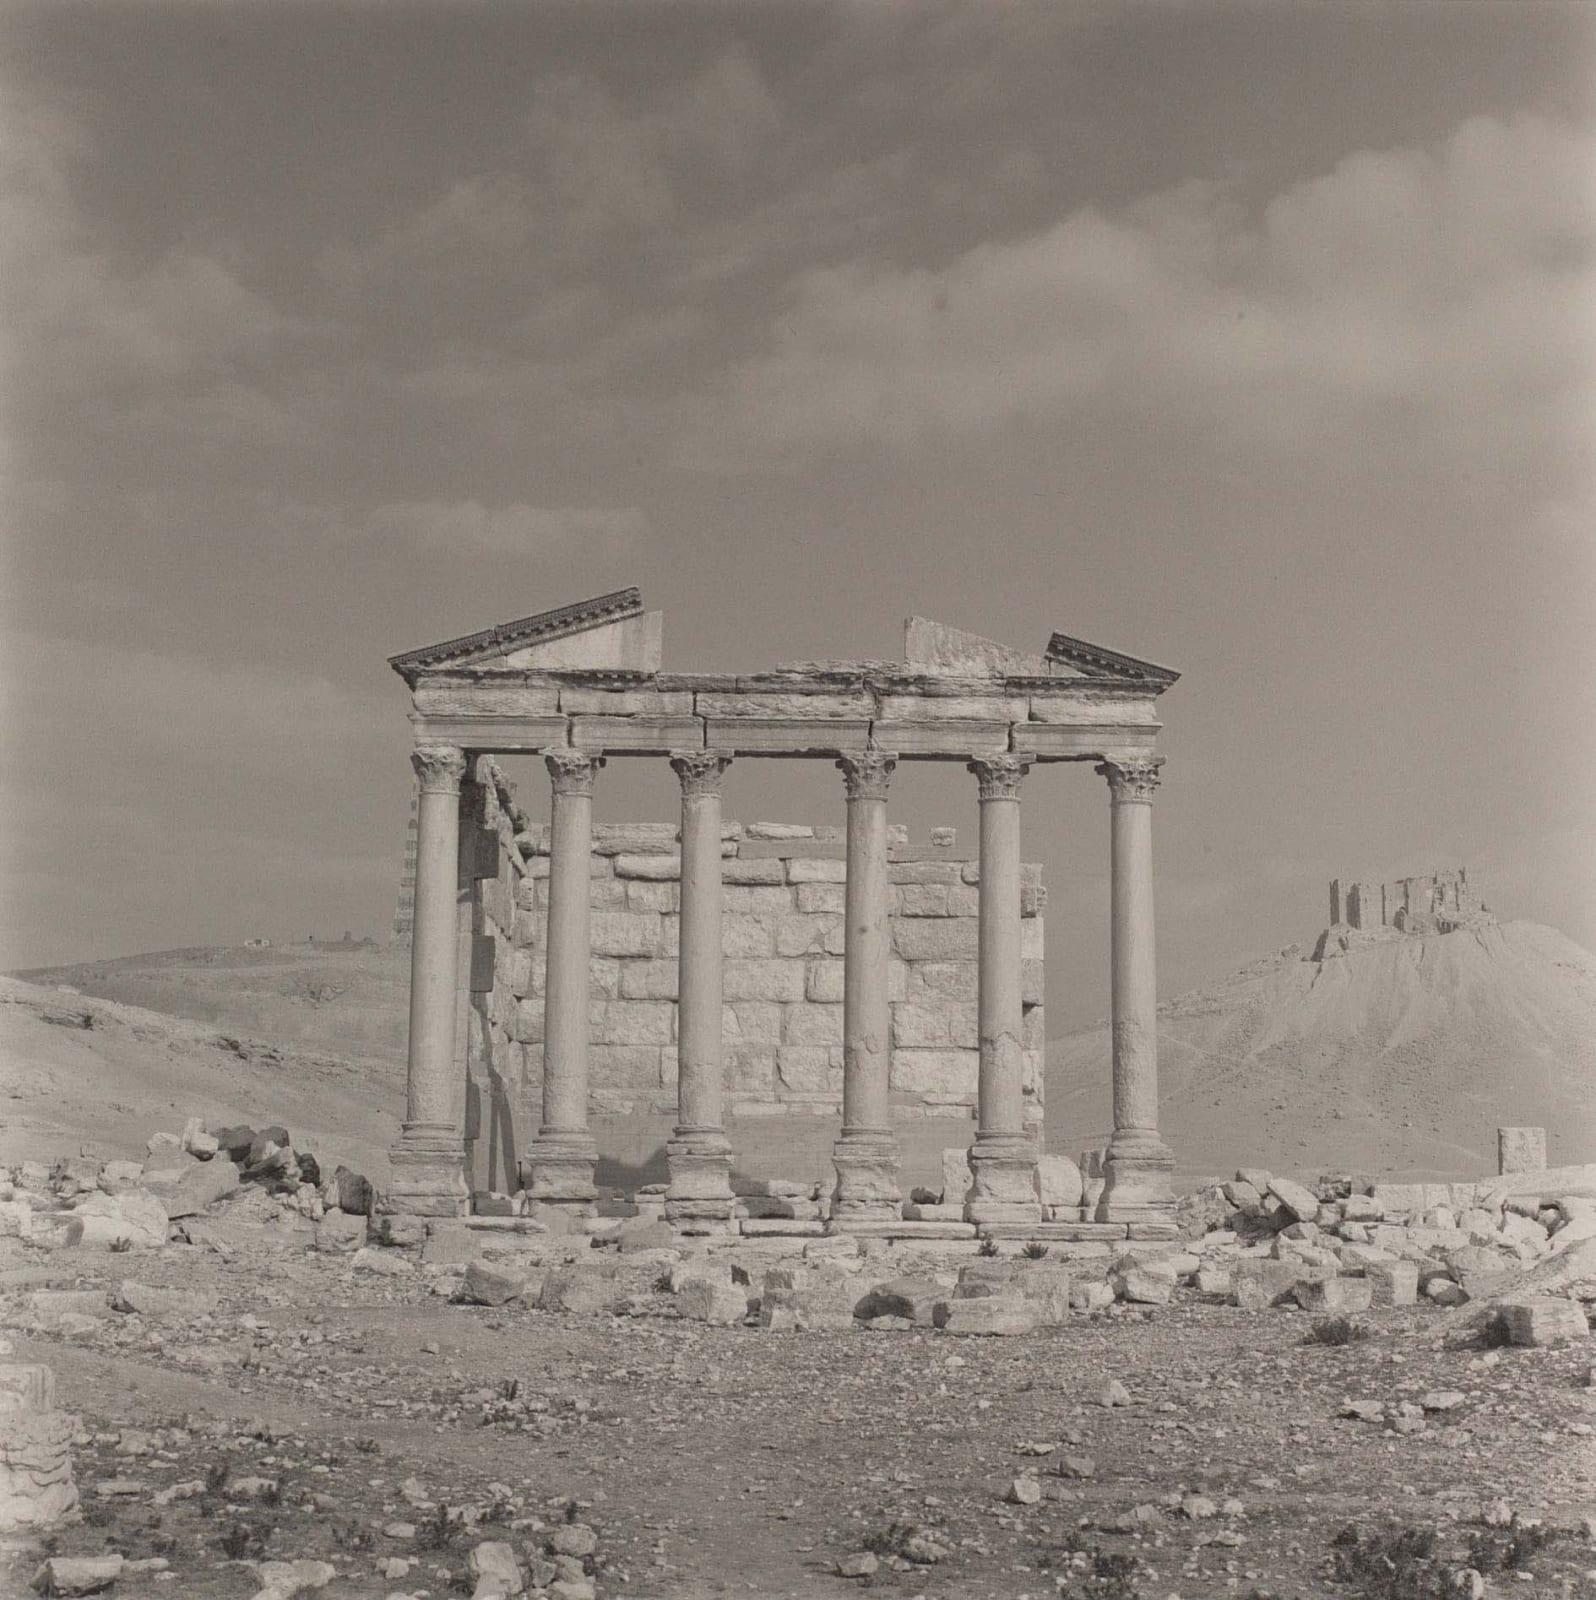 Lynn Davis photograph of temple ruins in Palmyra, Syria